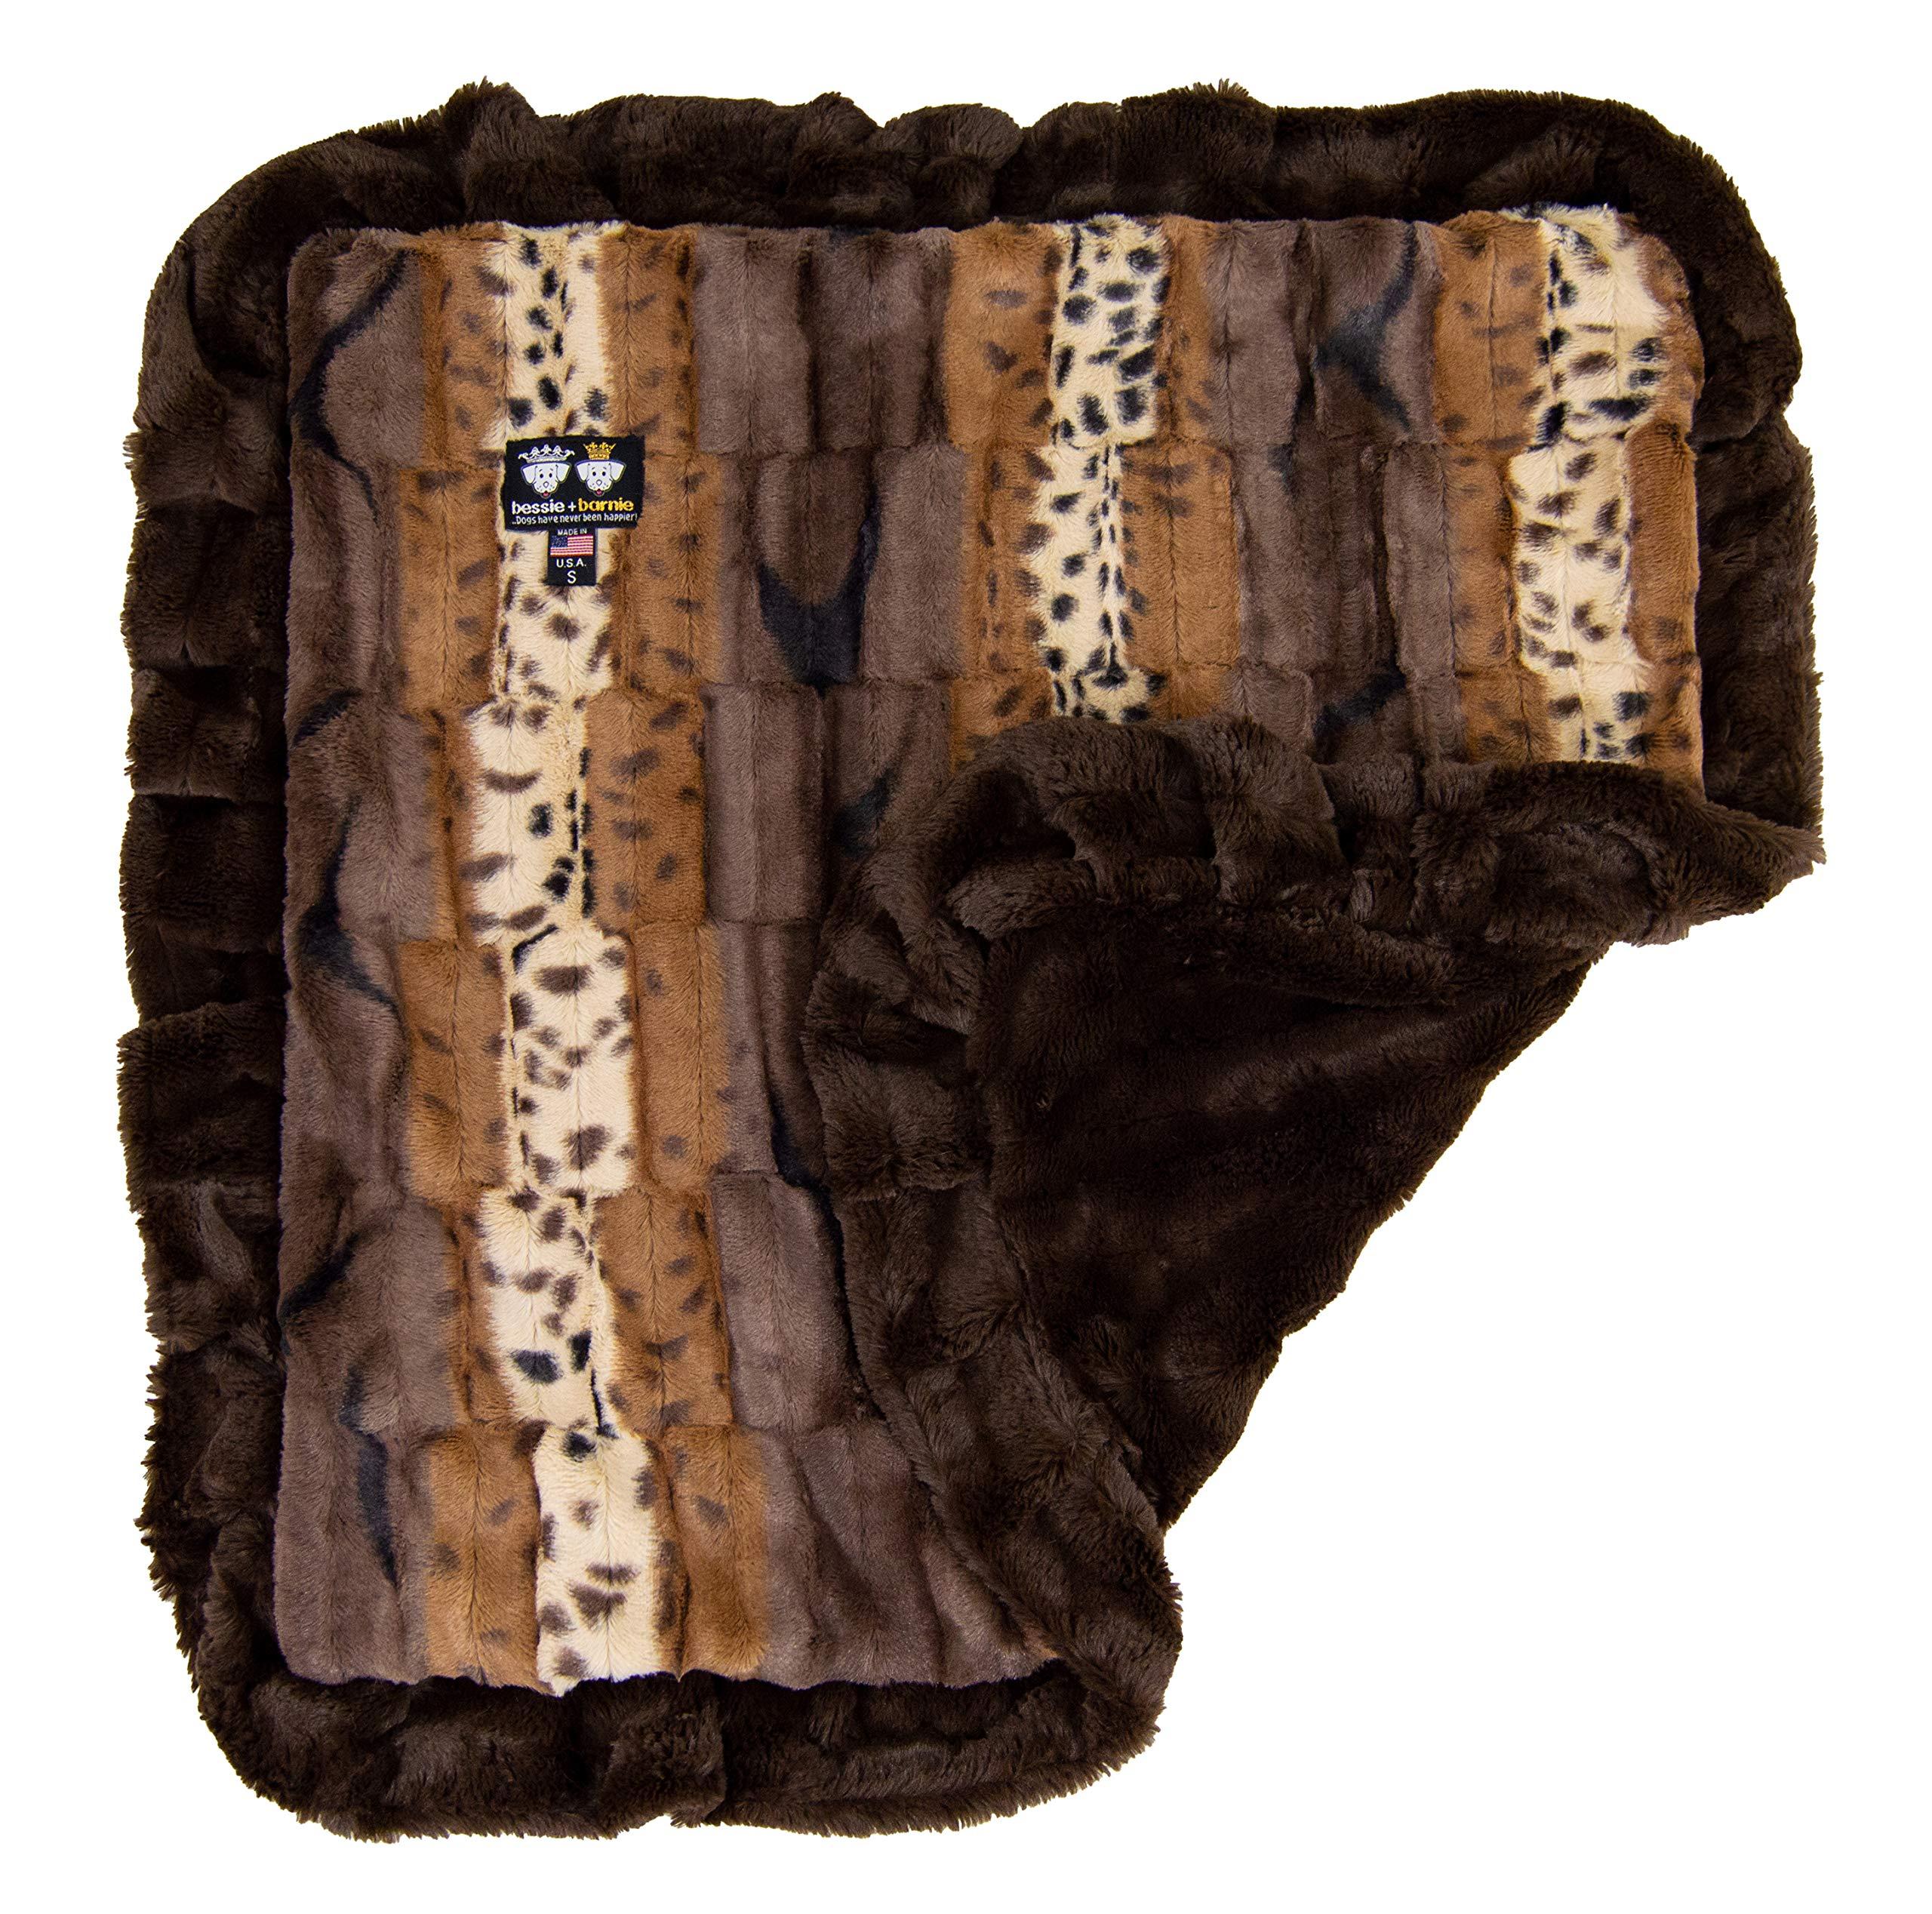 Bessie and Barnie Wild Kingdom/ Godiva Brown Luxury Ultra Plush Faux Fur Pet, Dog, Cat, Puppy Super Soft Reversible Blanket (Multiple Sizes)